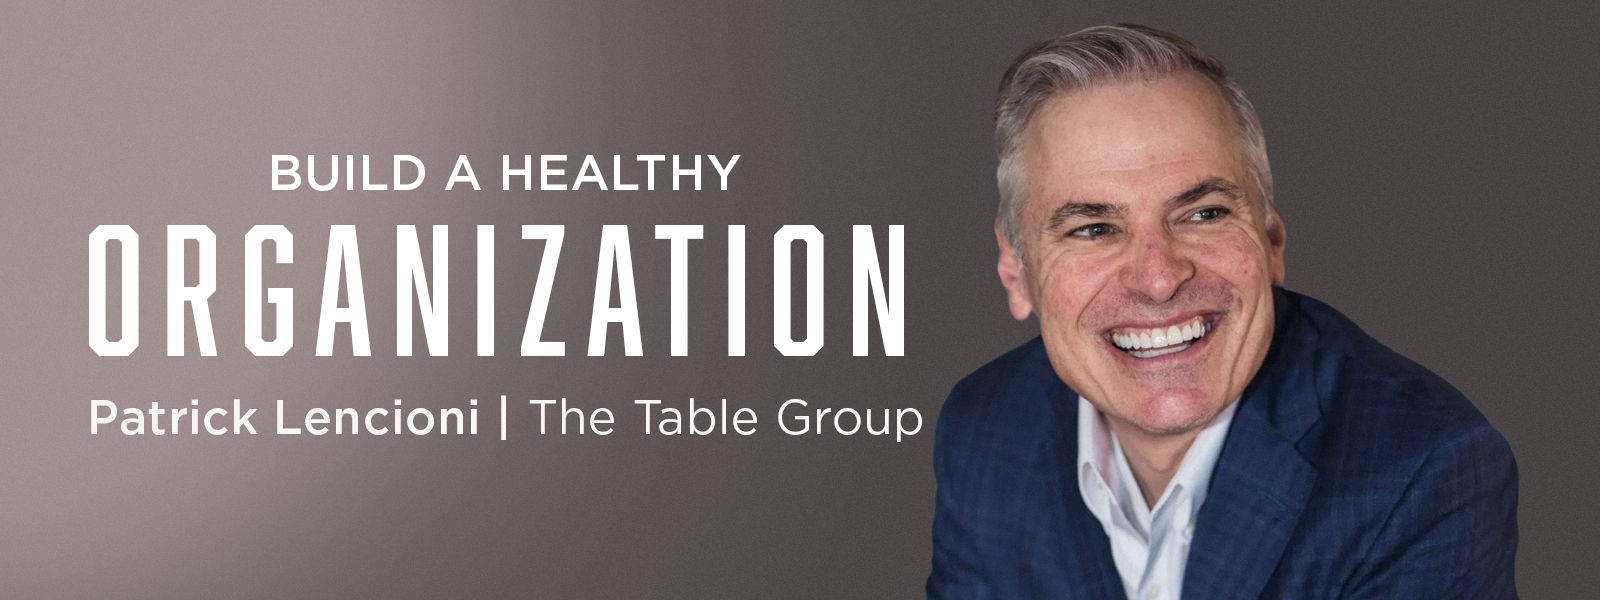 Build a Healthy Organization